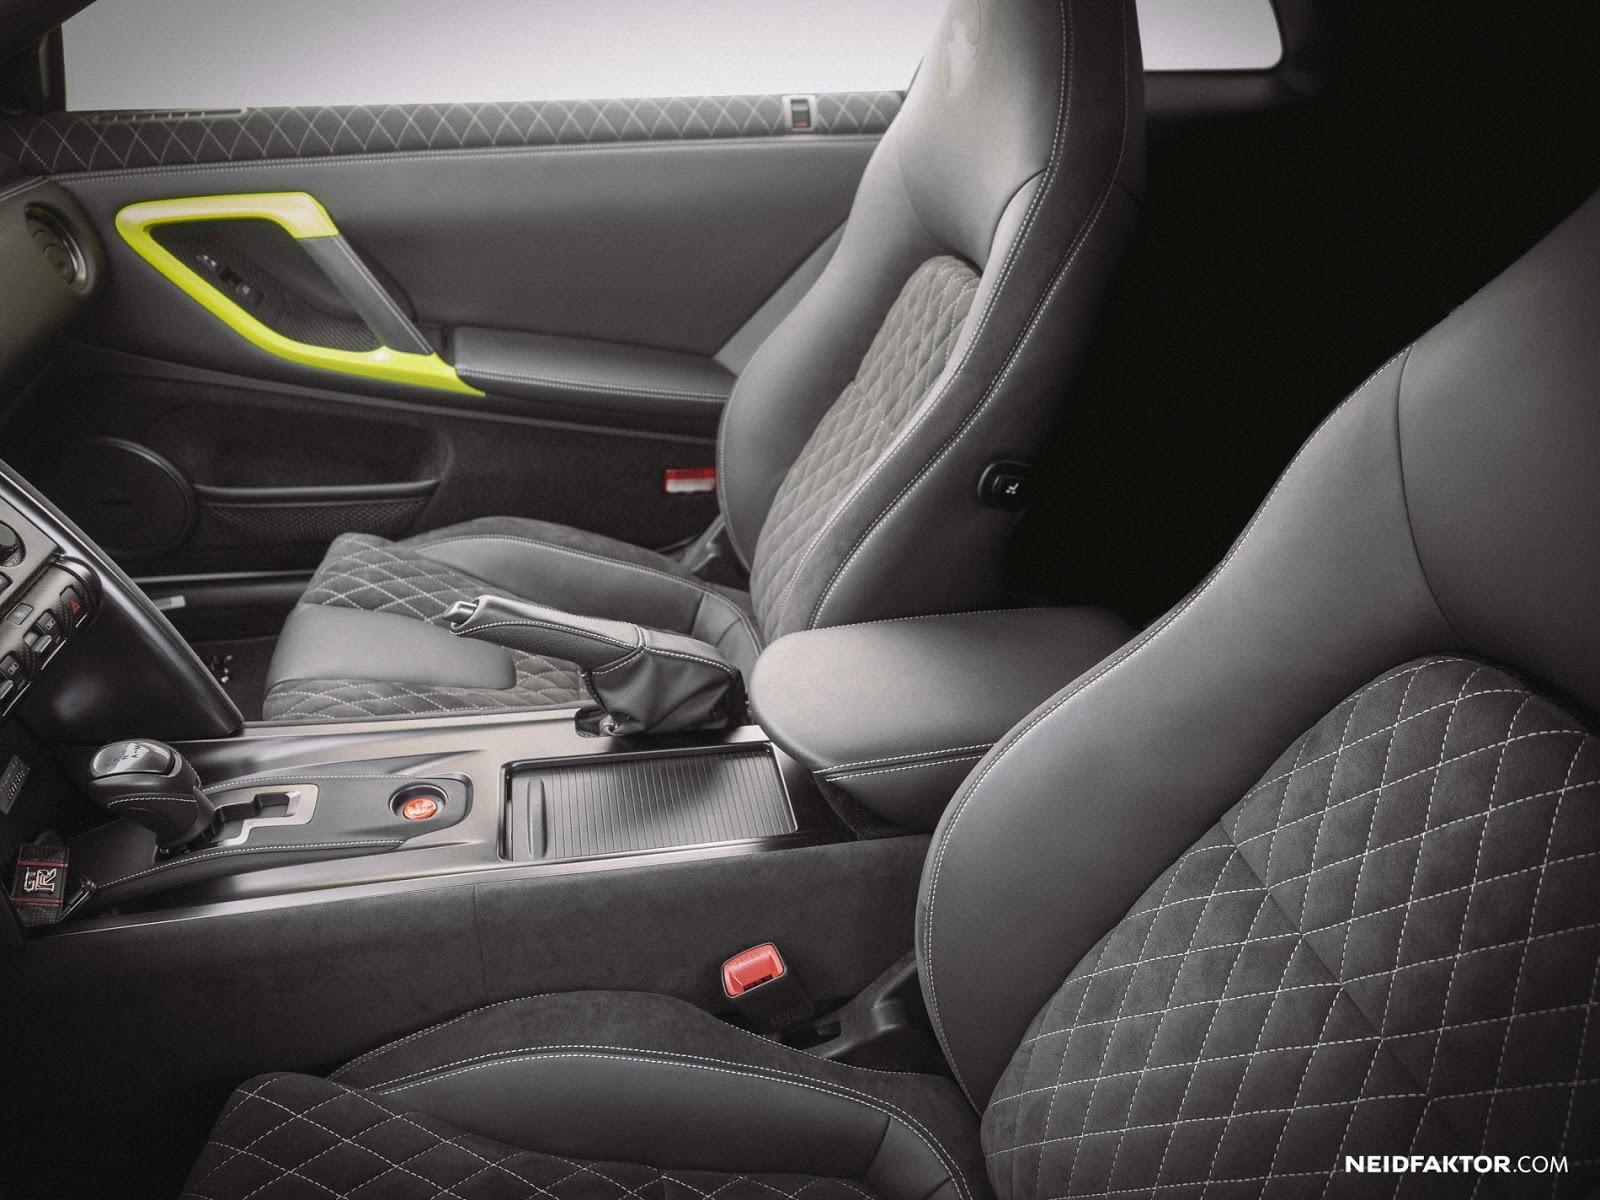 Nissan_GT-R_Neidfaktor_0002